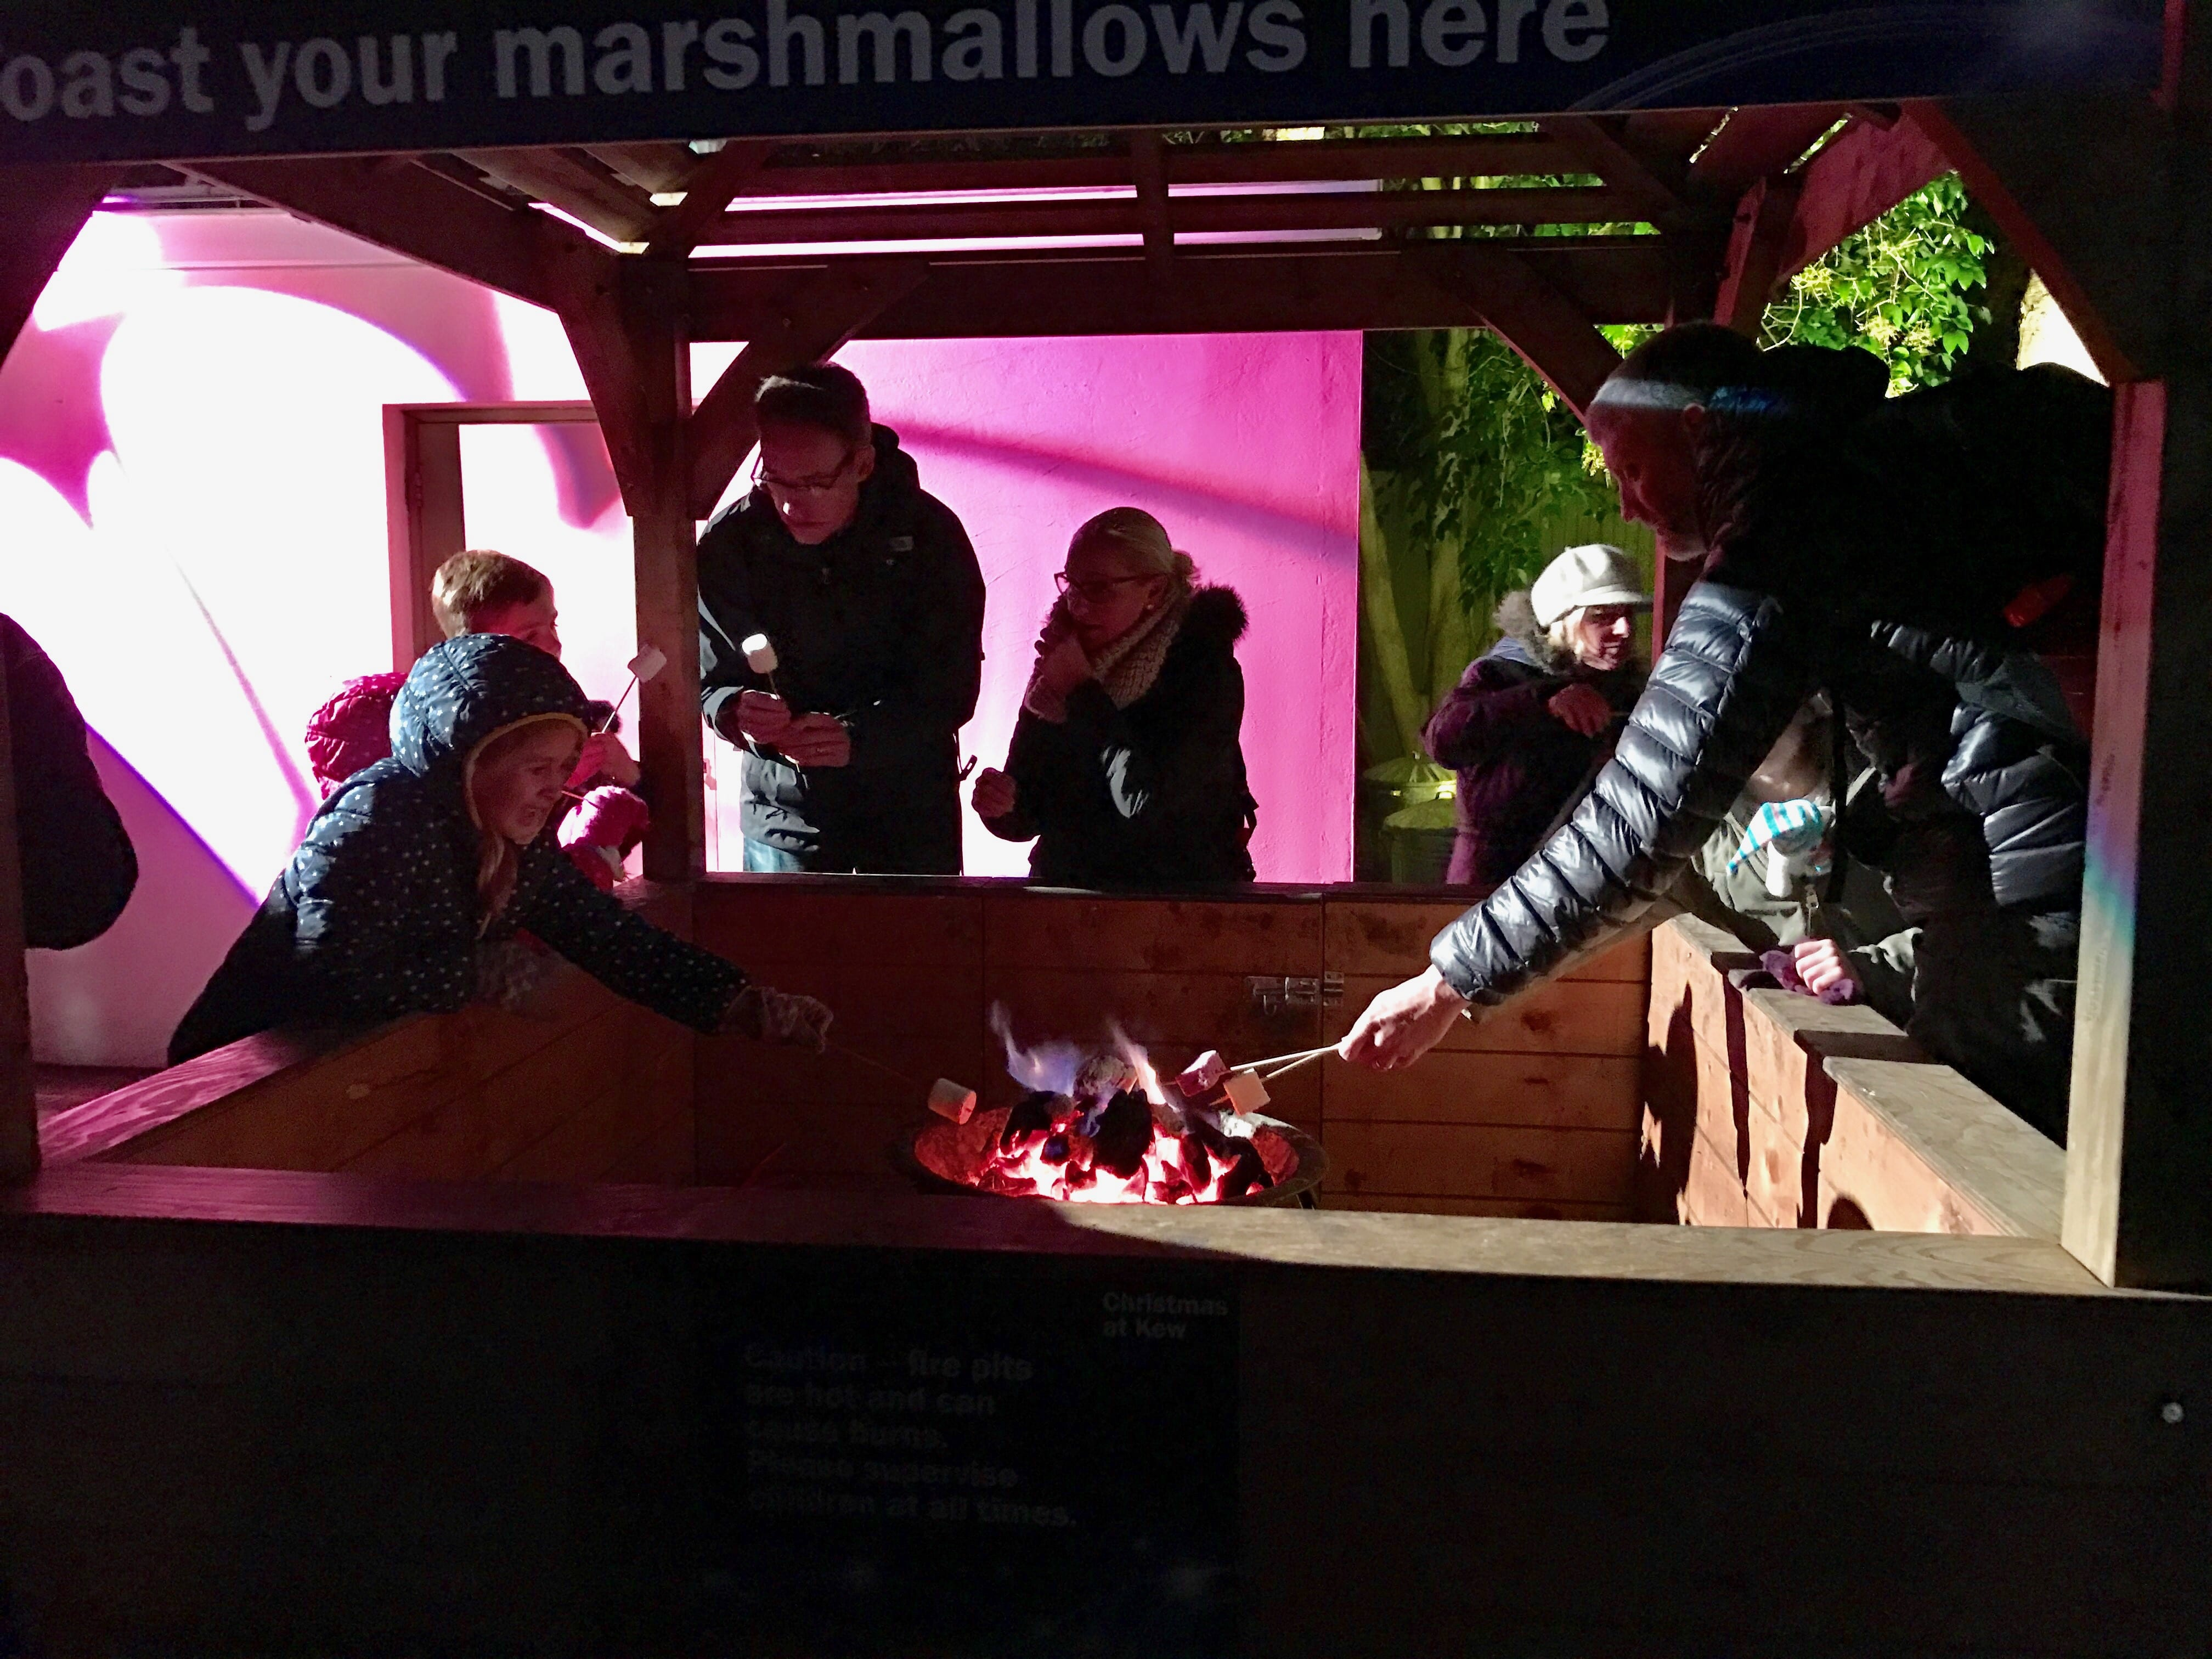 Marshmallow Toasting Christmas at Kew